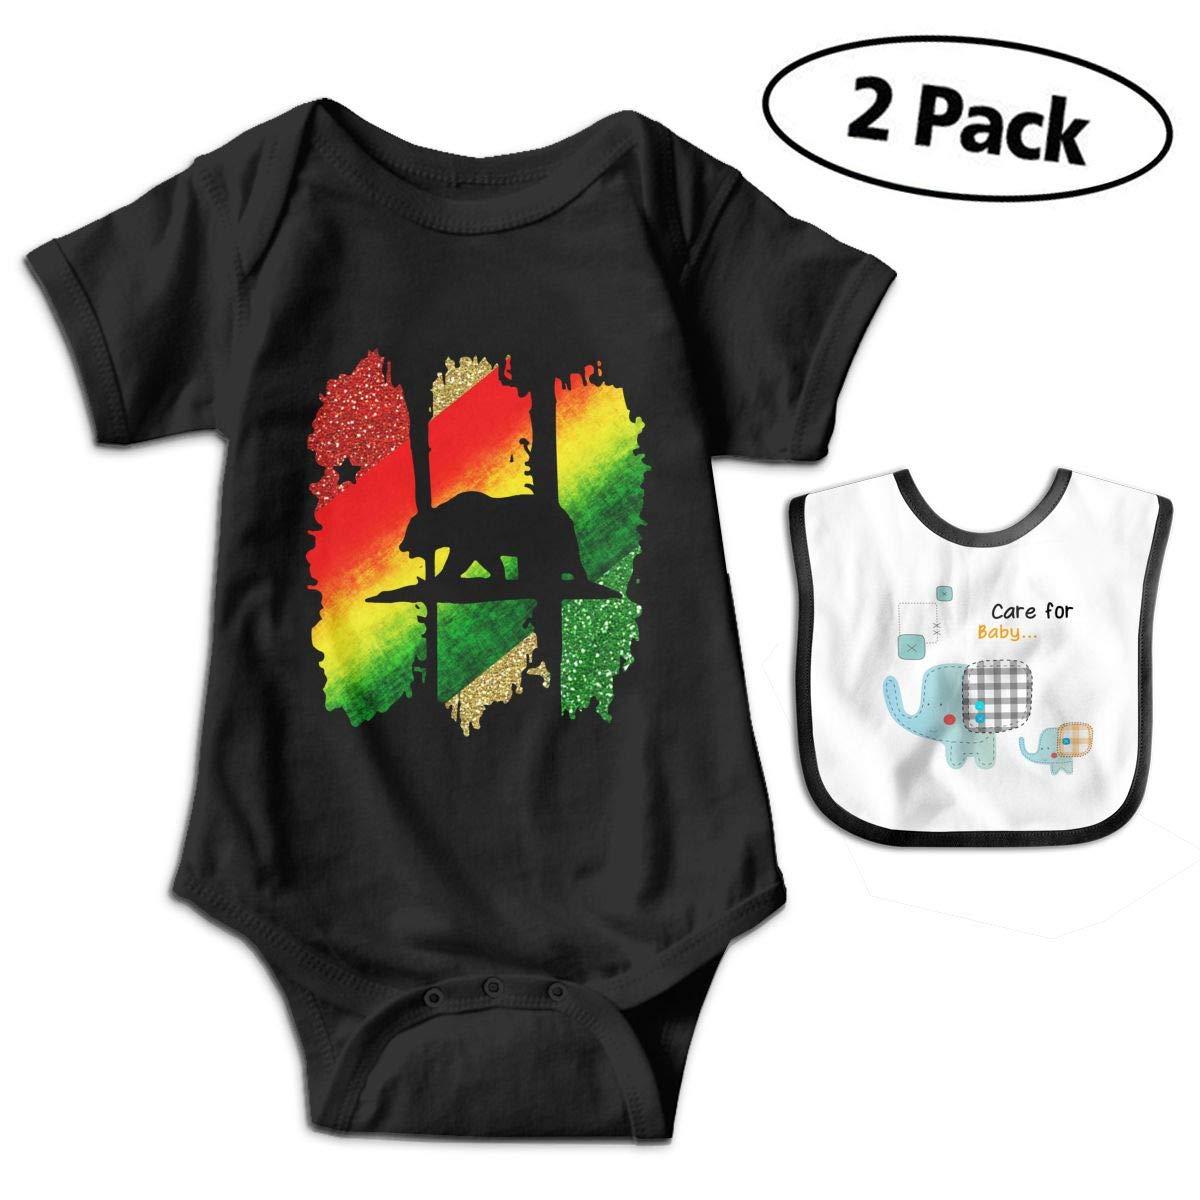 Harataki Rasta California Republic Infant Baby Short Sleeve Romper Jumpsuit Bodysuit